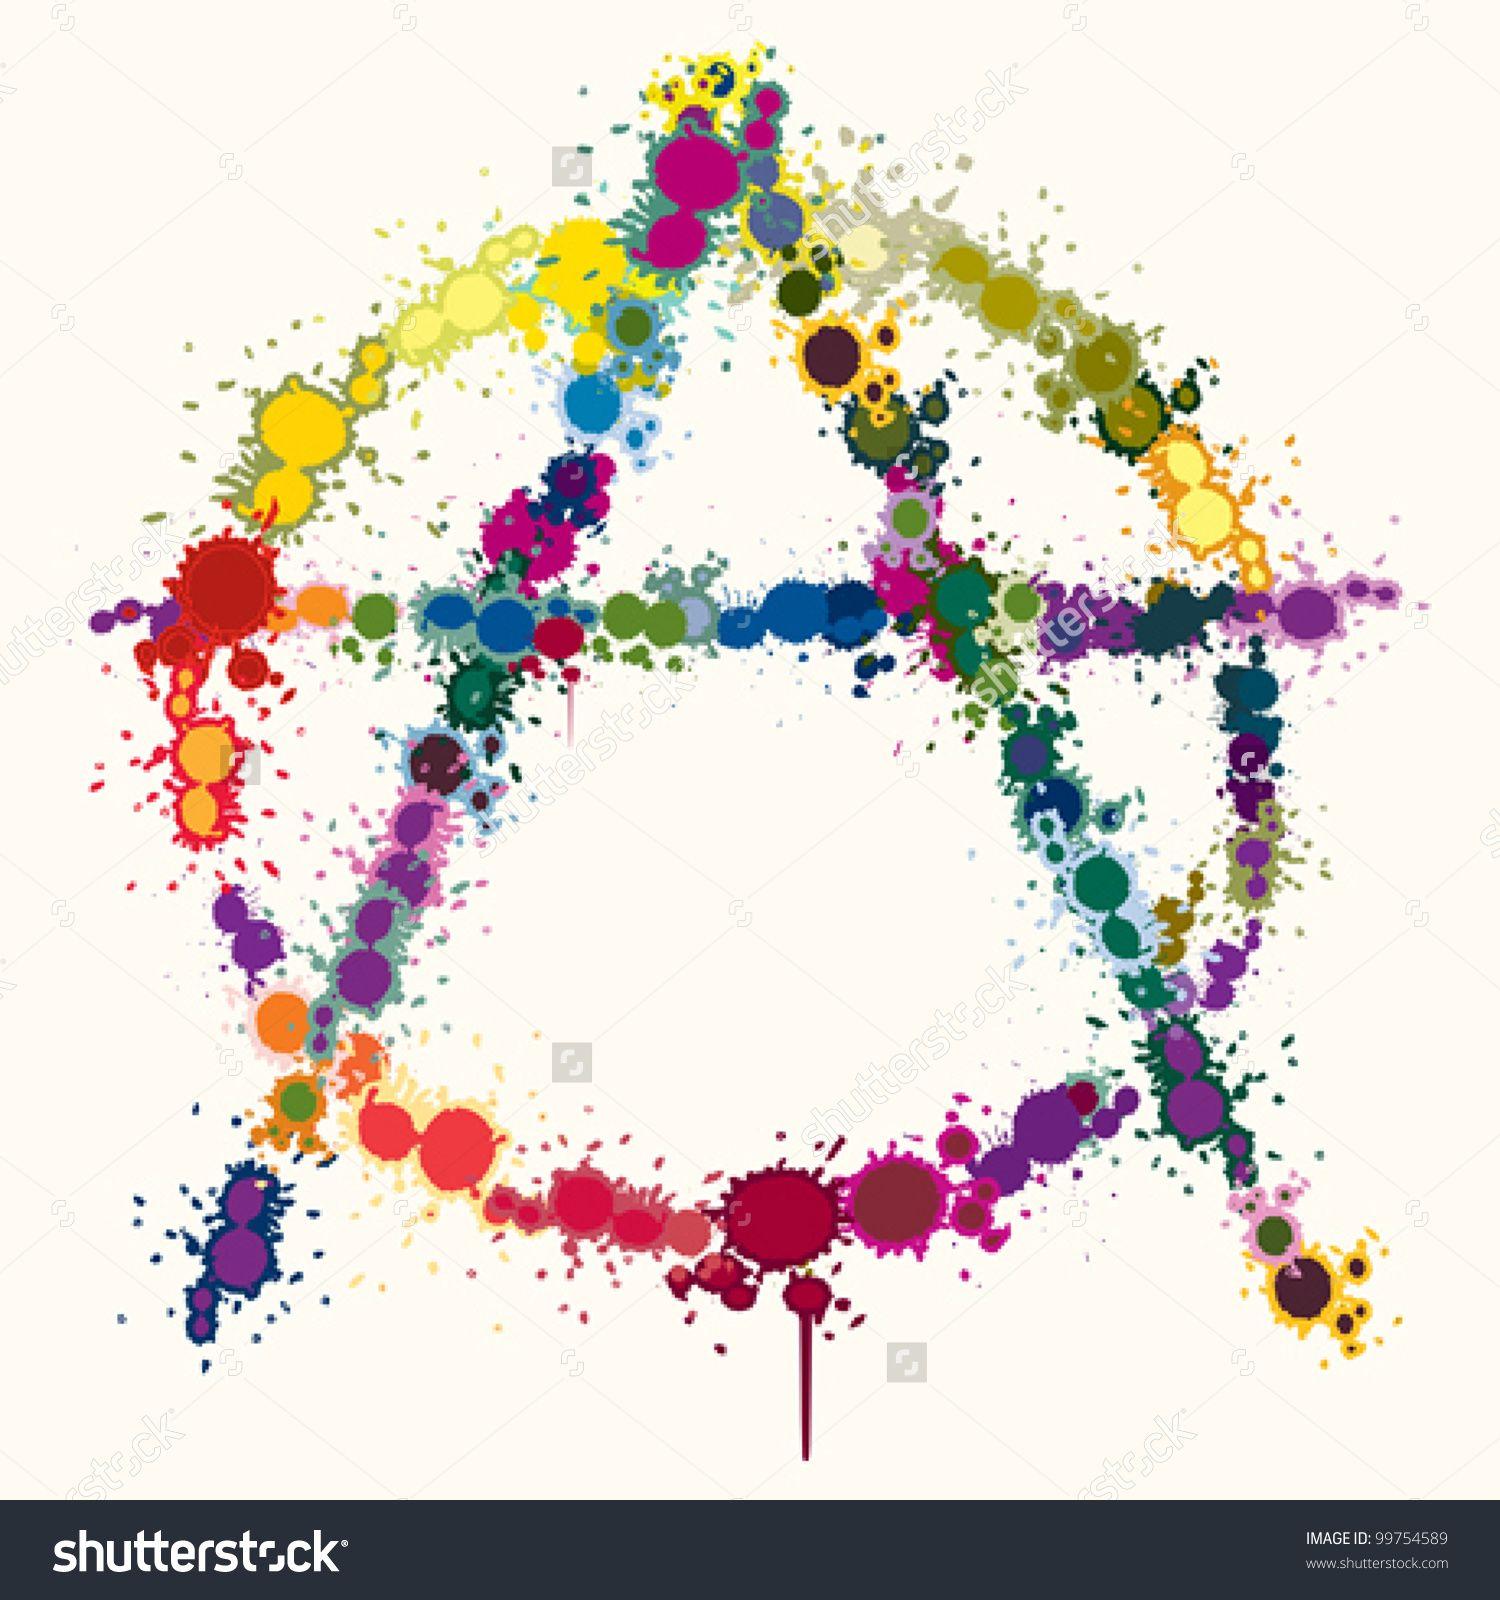 Colourful anarchy symbols google search grapfftics colourful anarchy symbols google search buycottarizona